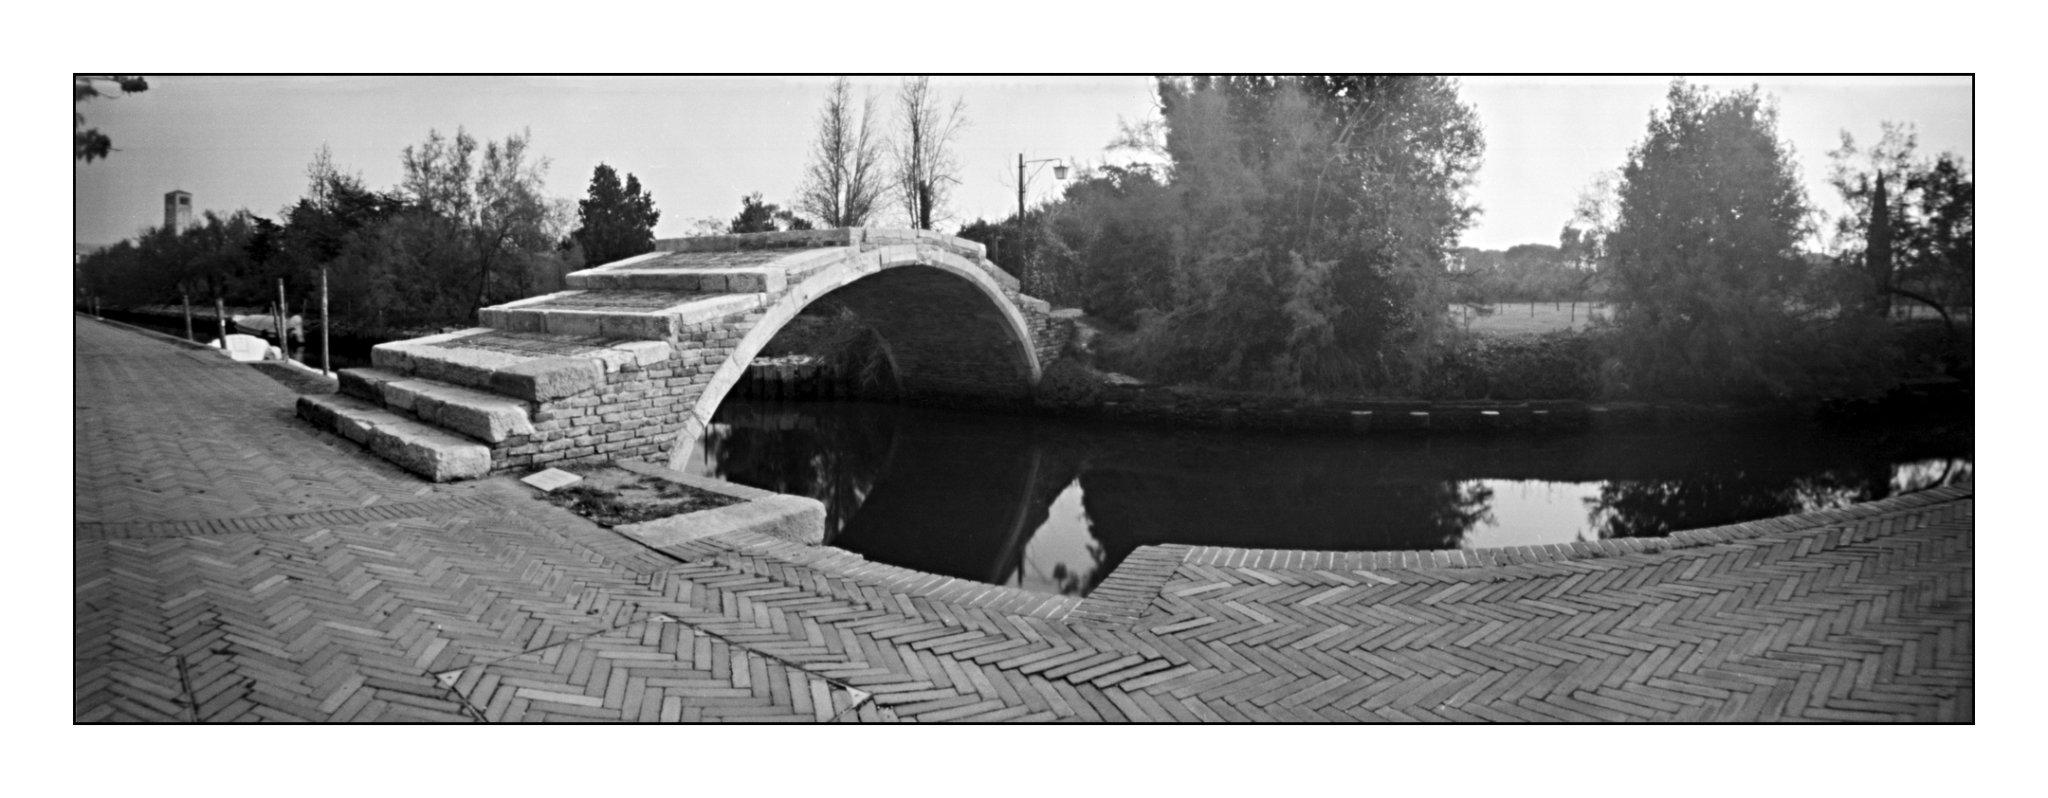 Torcello, Lochkamera 16x7 analog: Venedig, Fotograf: Steffen Lohse